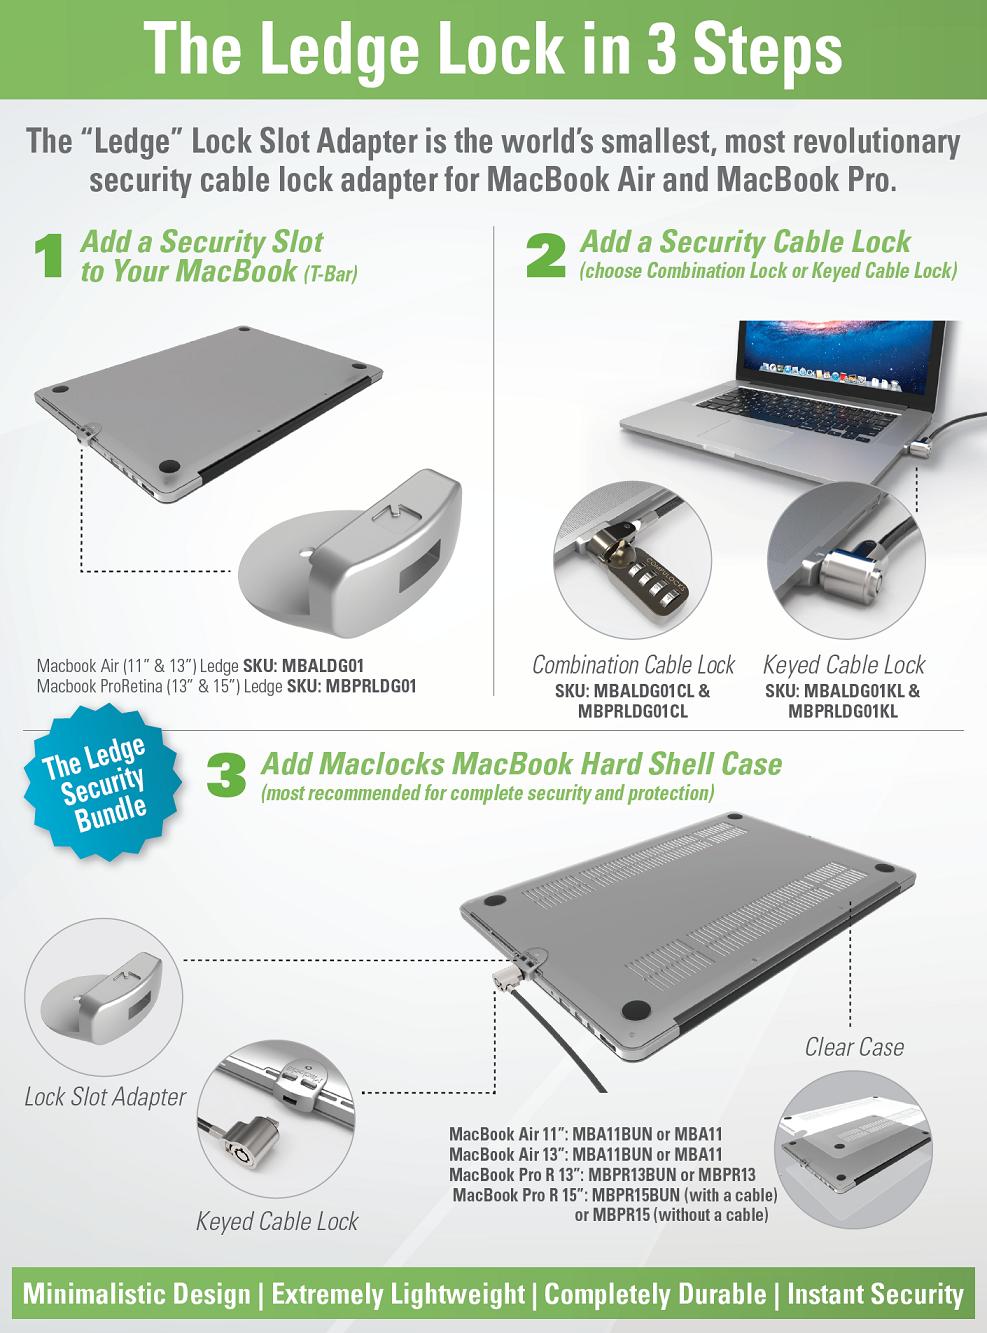 MacBook Lock Slot Adapter